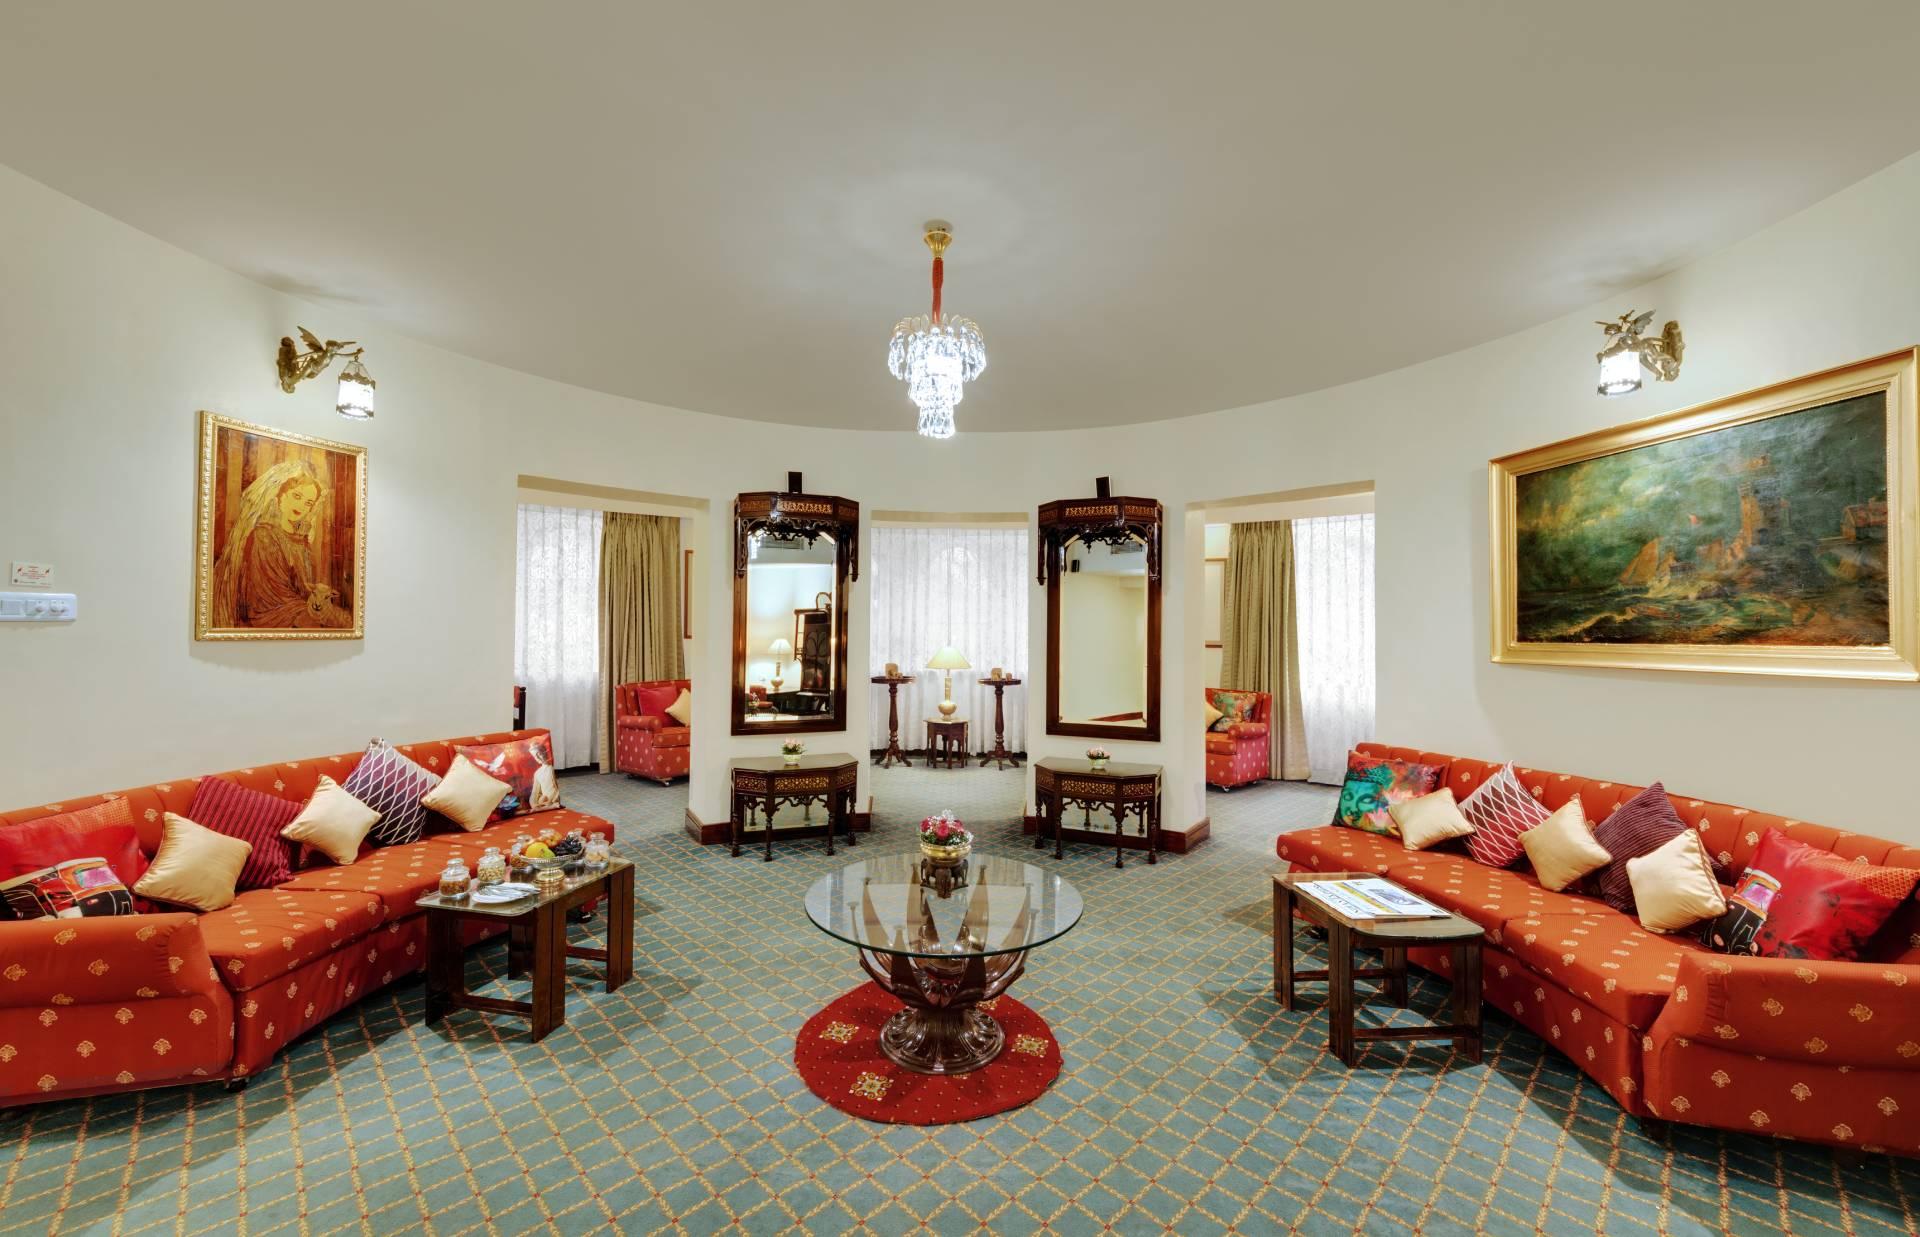 chennai pallava suite ambassador pallava reception area 2 banner - The Ambassador | Heritage Hotels in Mumbai, Aurangabad, Chennai - Our Rooms